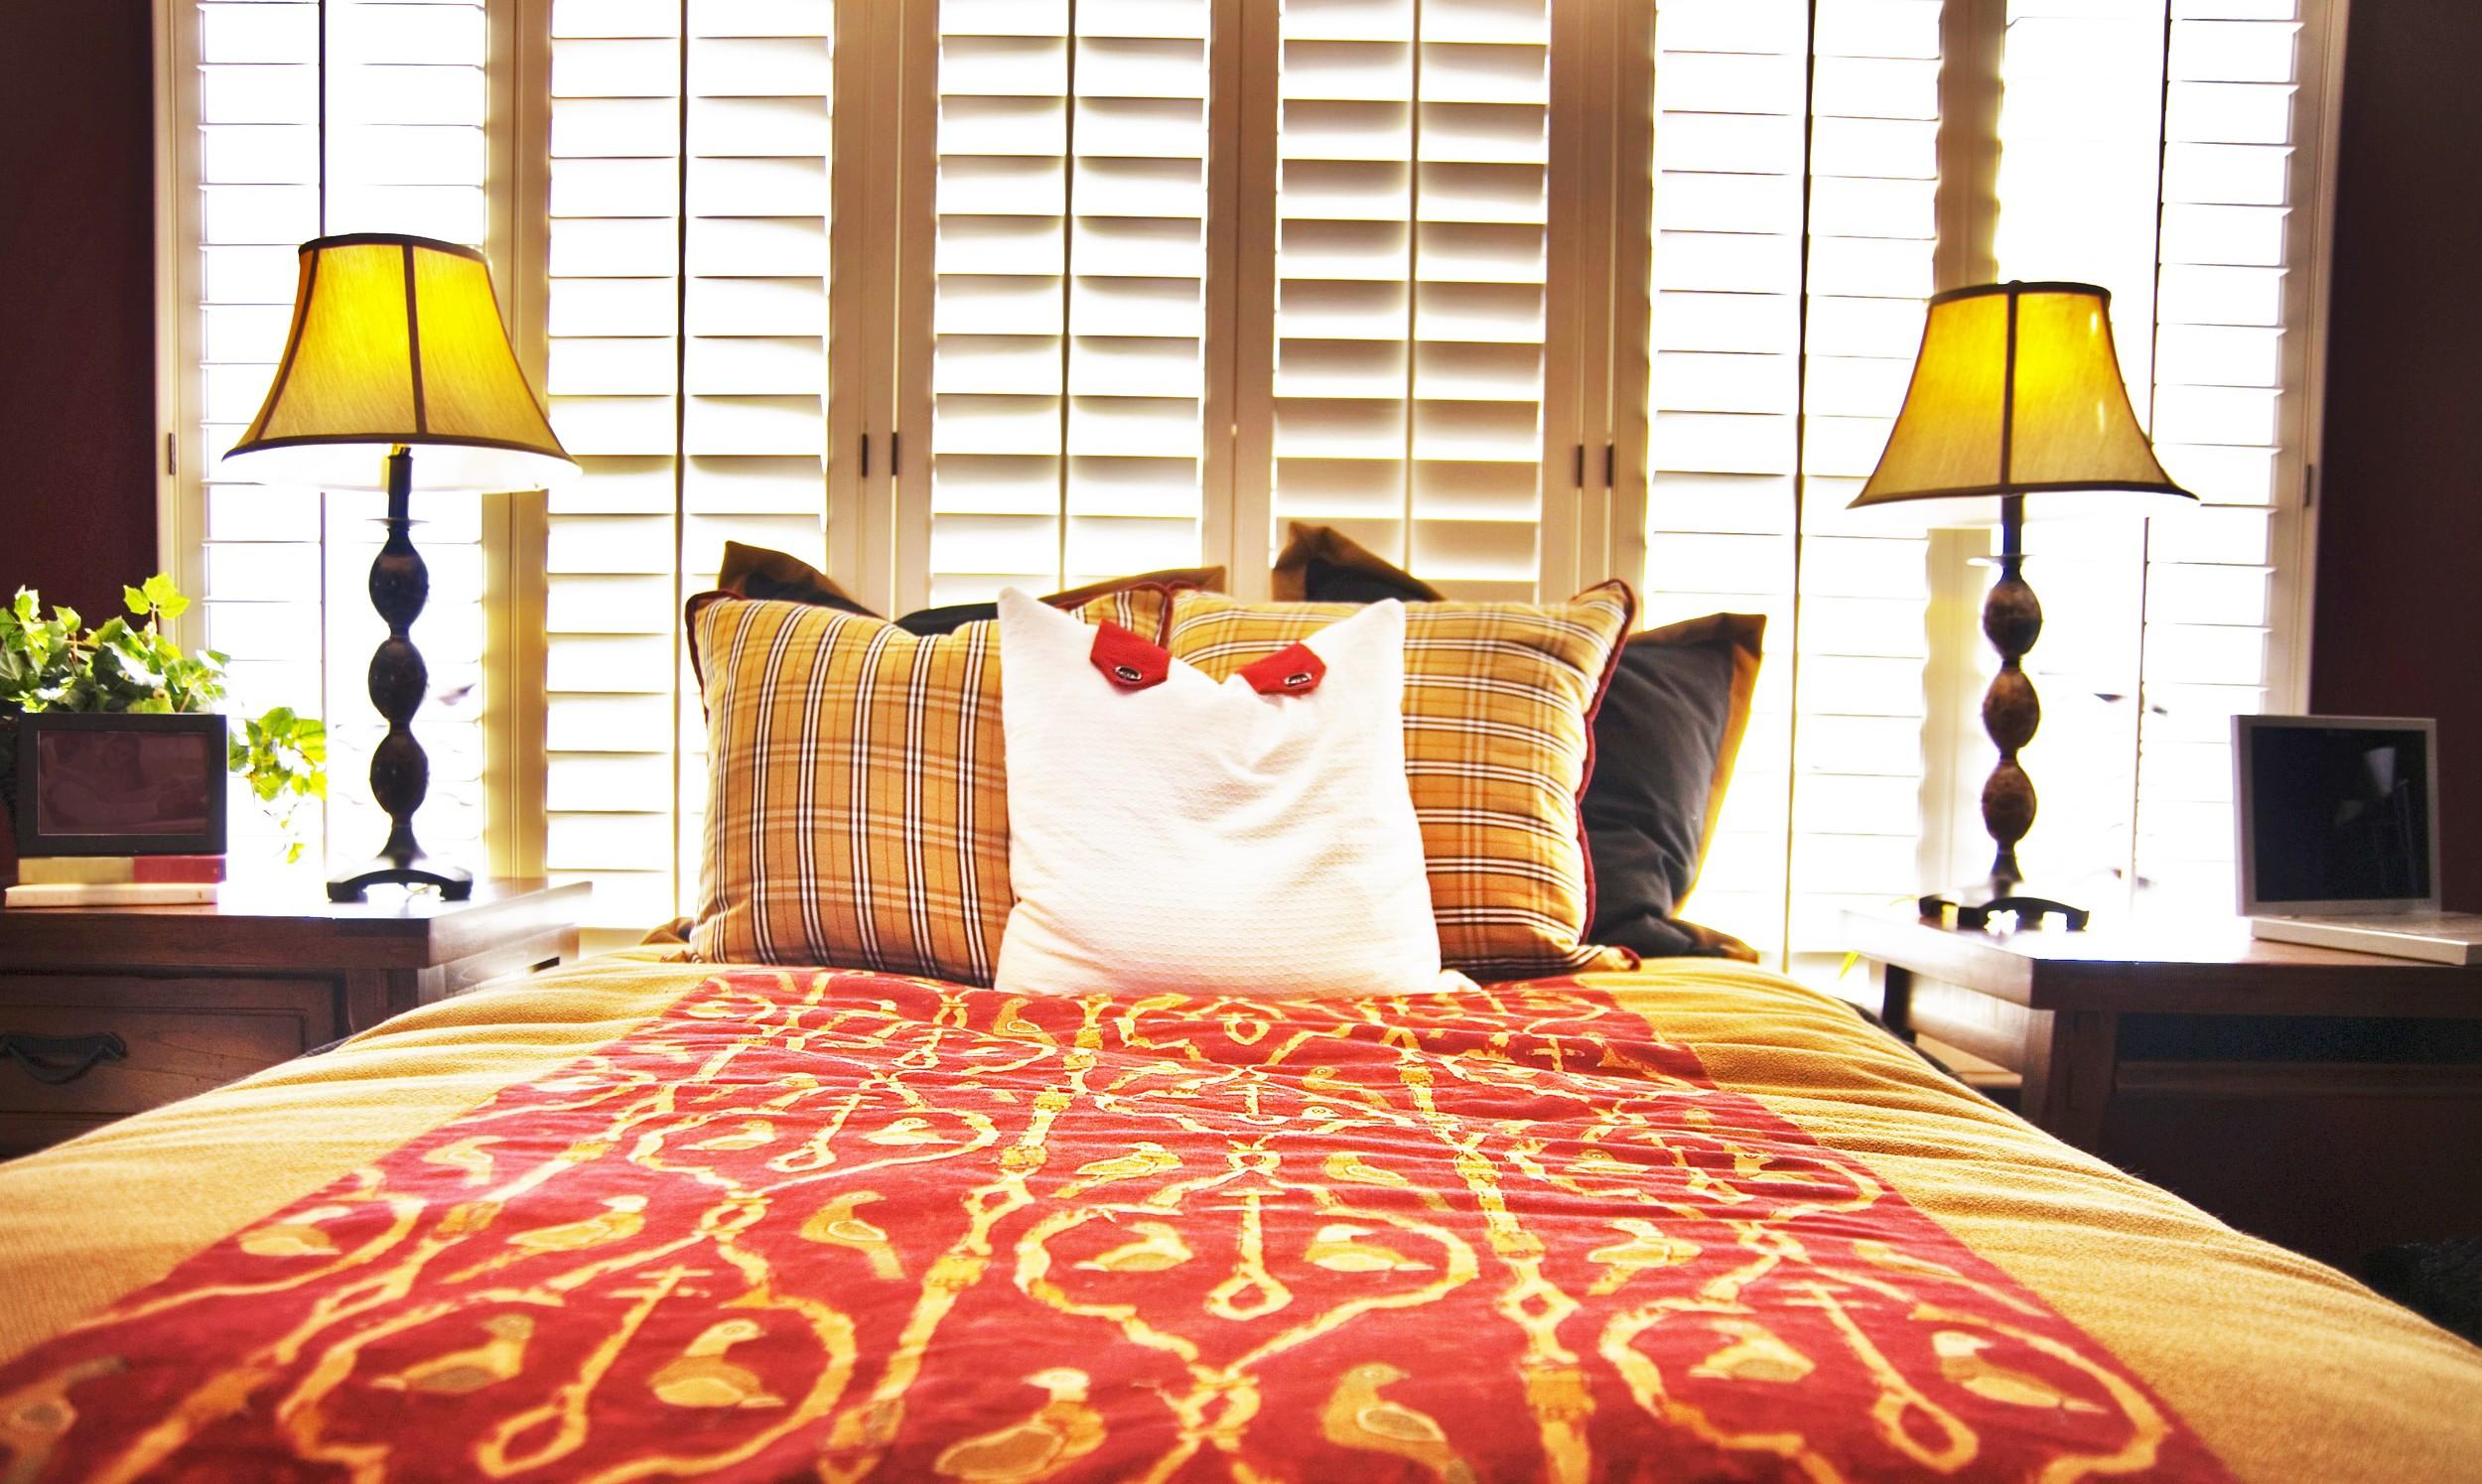 bautiful-bedroom-with-shutters.jpg